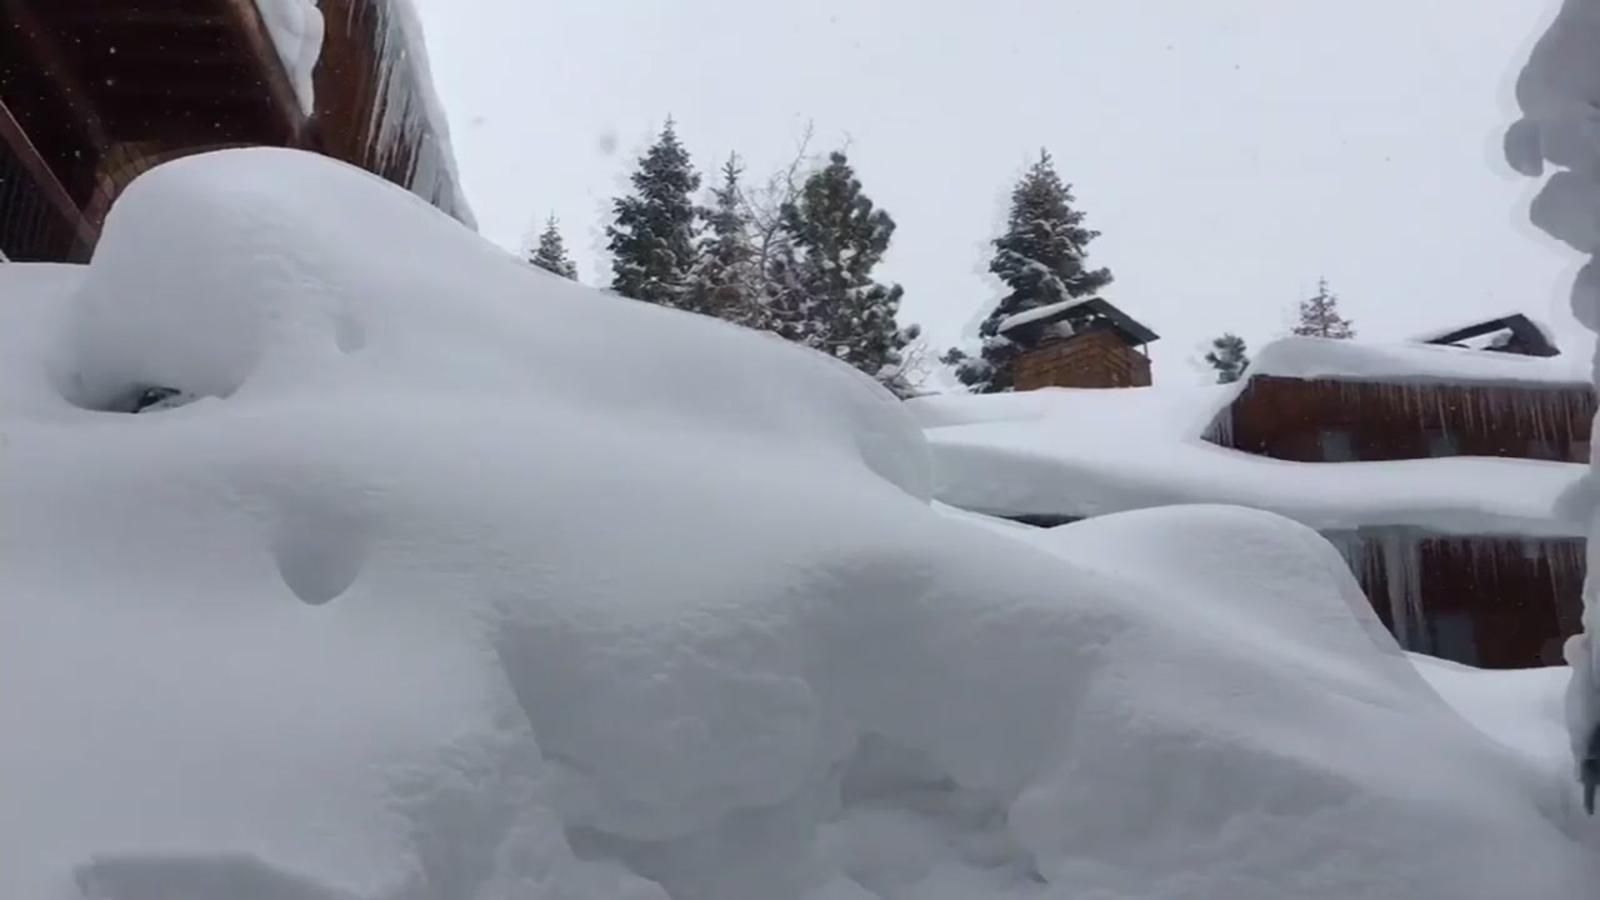 5143172 021719 kgo tri sunday snow img Image 18 44 56,19 jpg?w=1600.